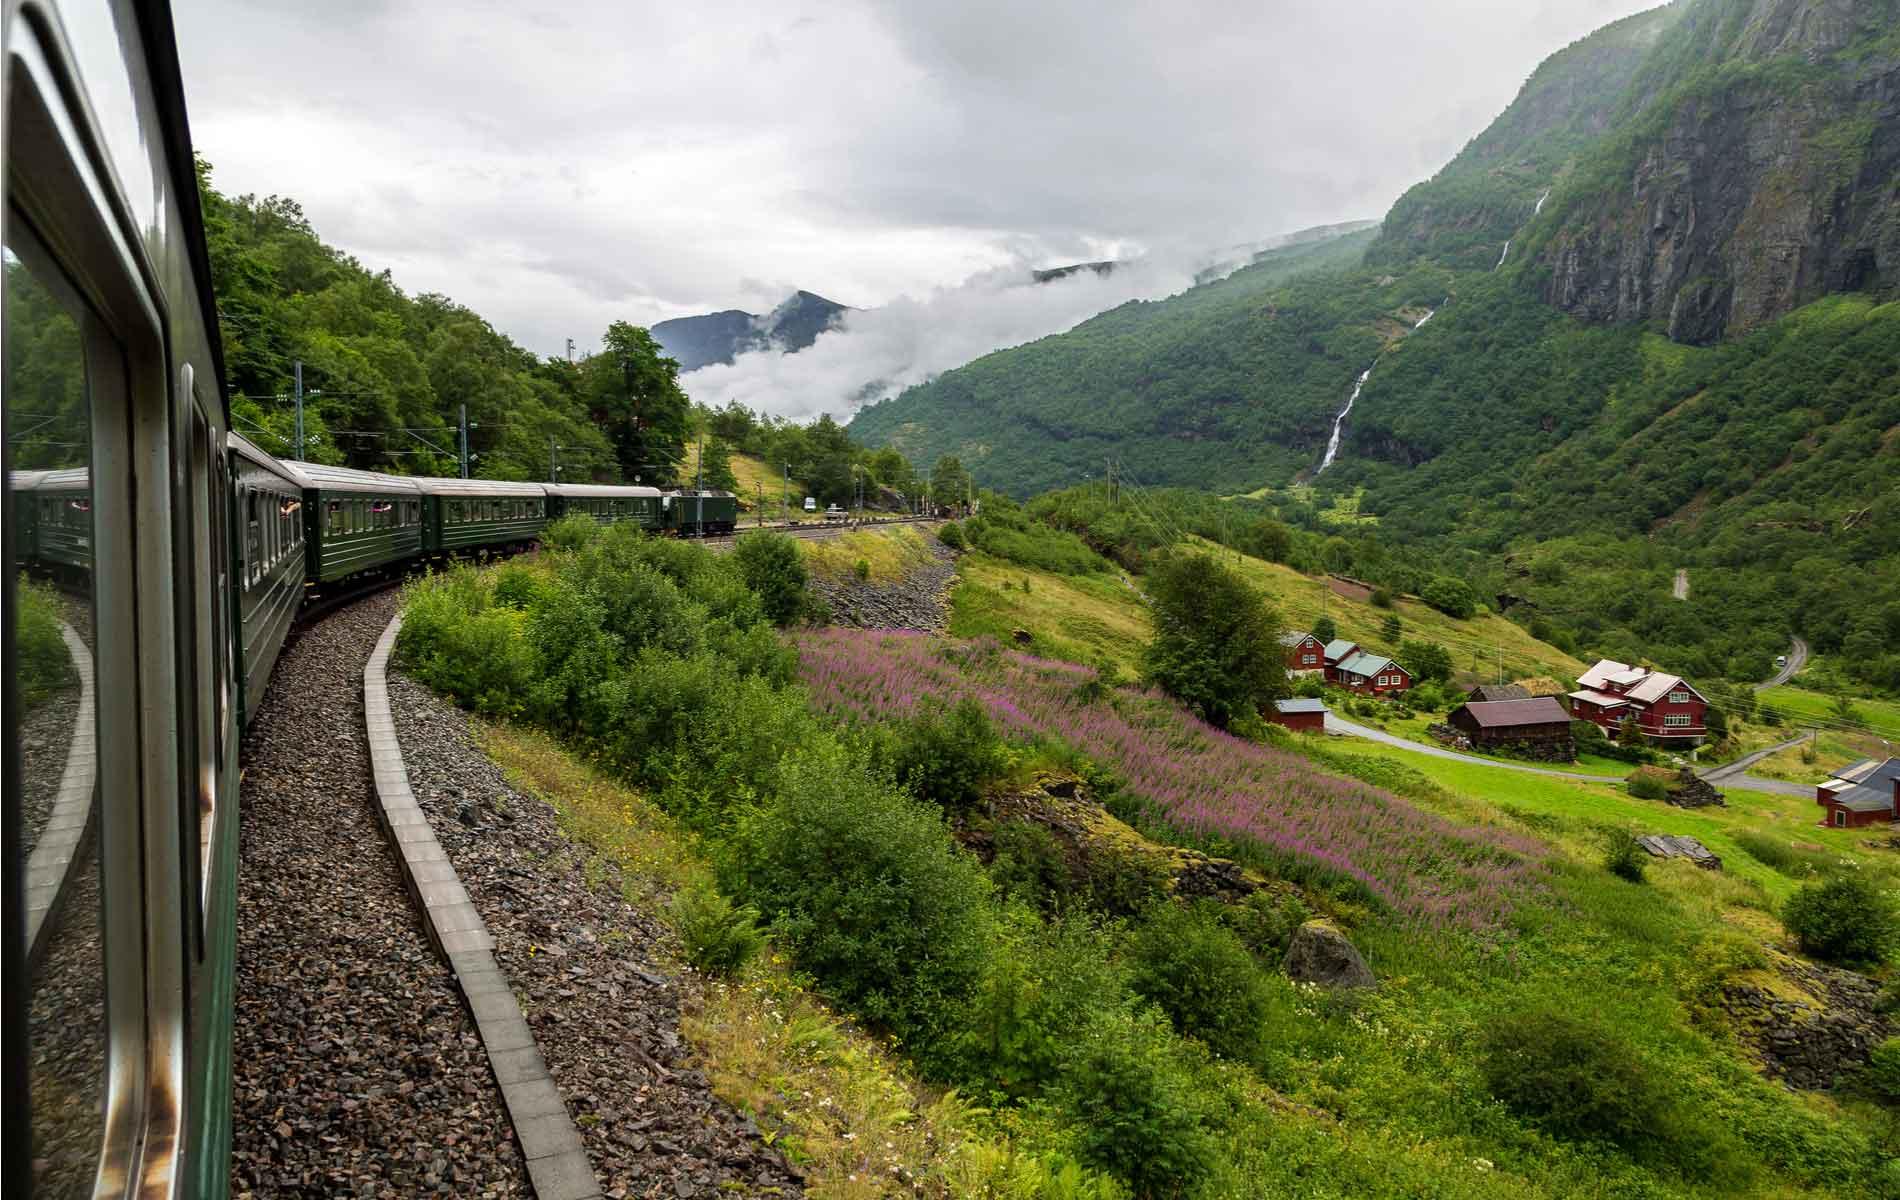 The Flam Railway in Norway